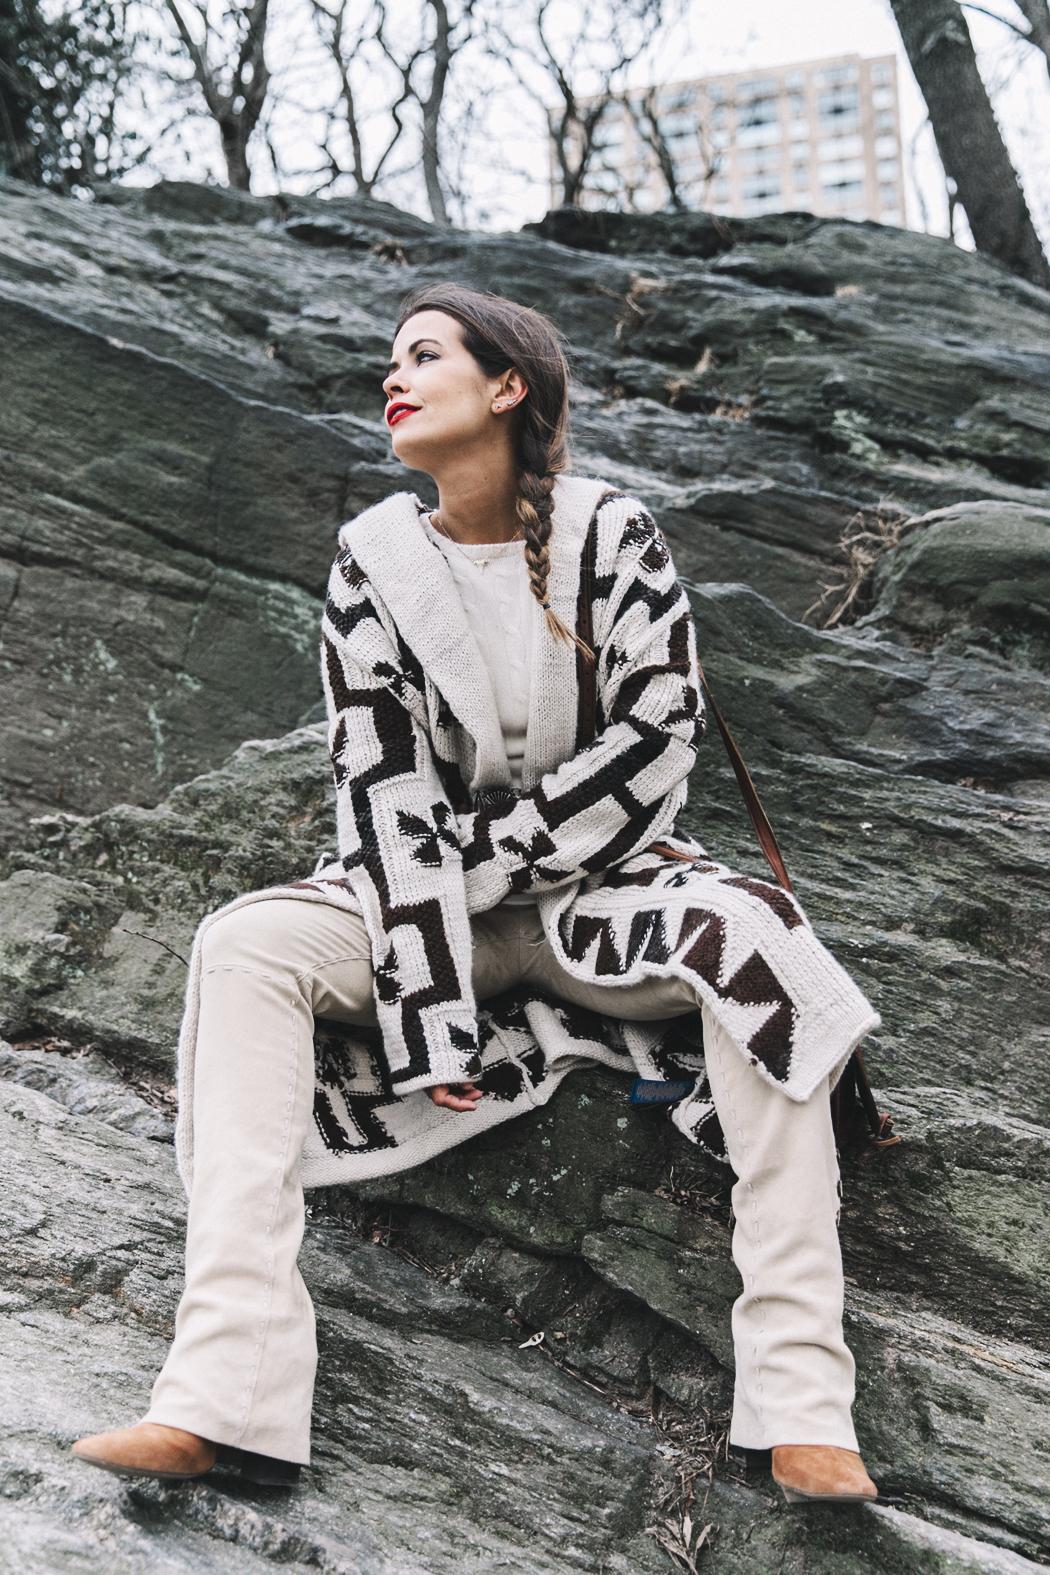 Polo_Ralph_Lauren_Collage_Vintage-Street_Style-NYFW-New_York_Fashion_Week-Knit_Jacket-Cream_Trousers-Boho-Winter_White-8